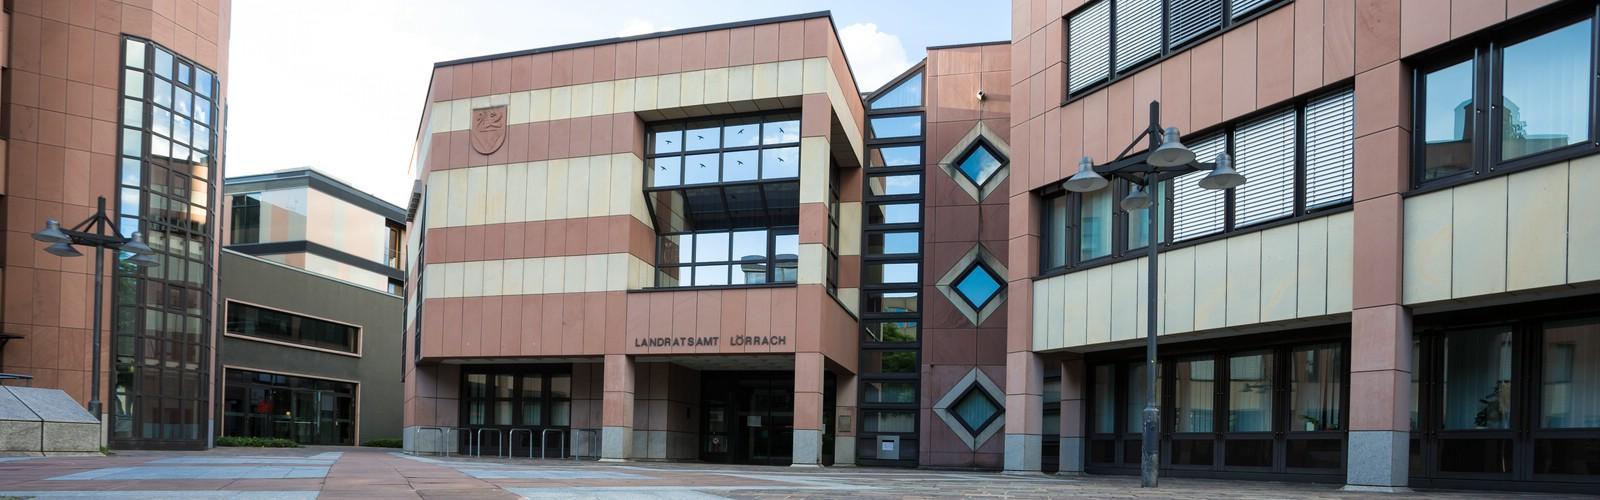 Landratsamt Lörrach, Eingangsbereich